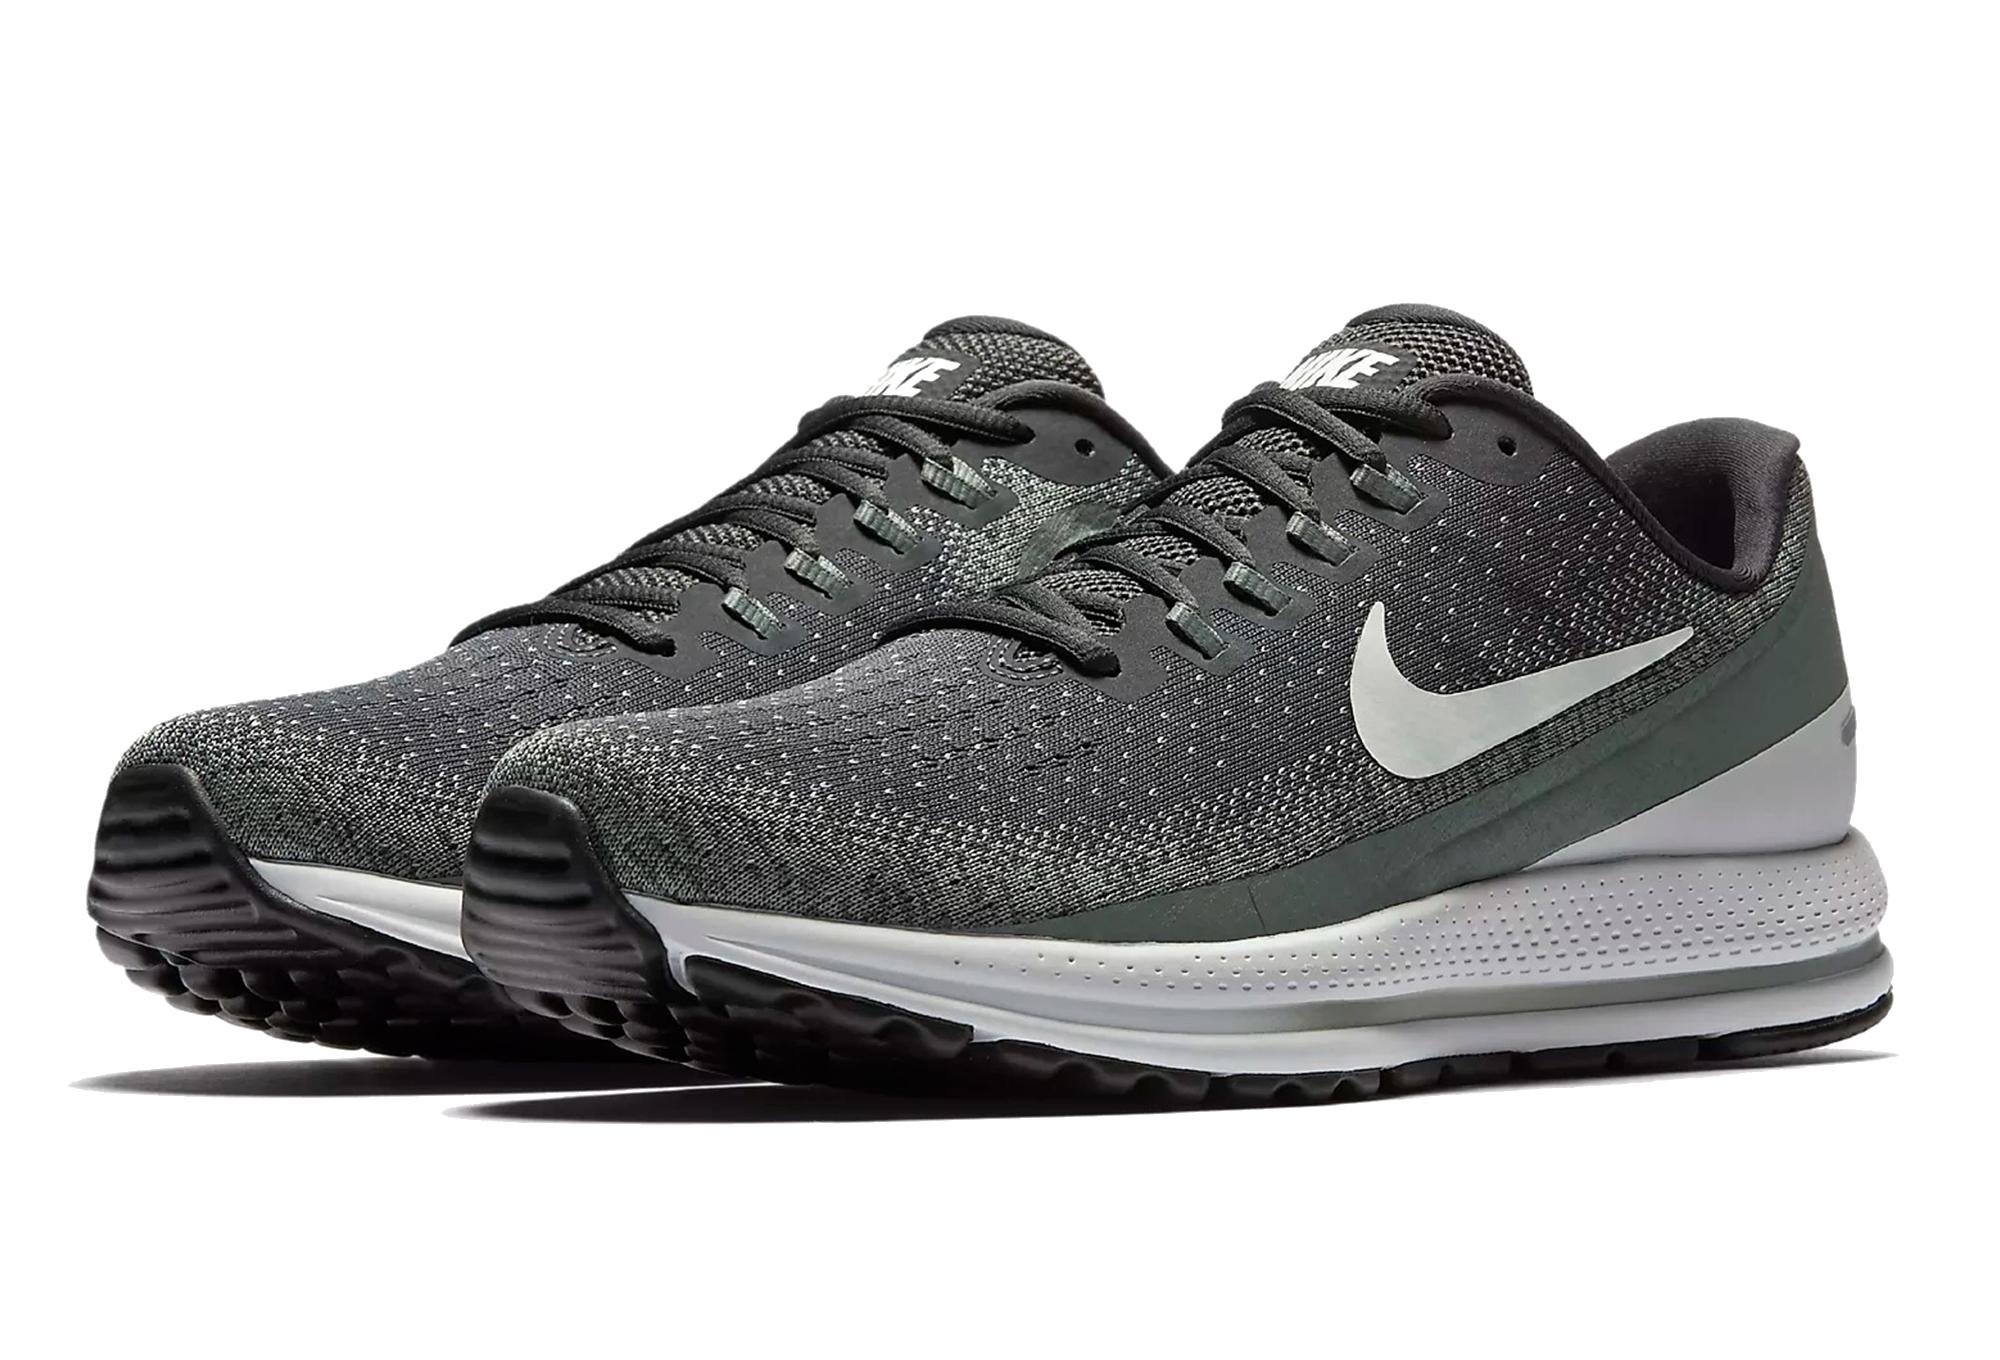 best website 81263 c1b91 Chaussures de Running Nike Air Zoom Vomero 13 Gris   Vert